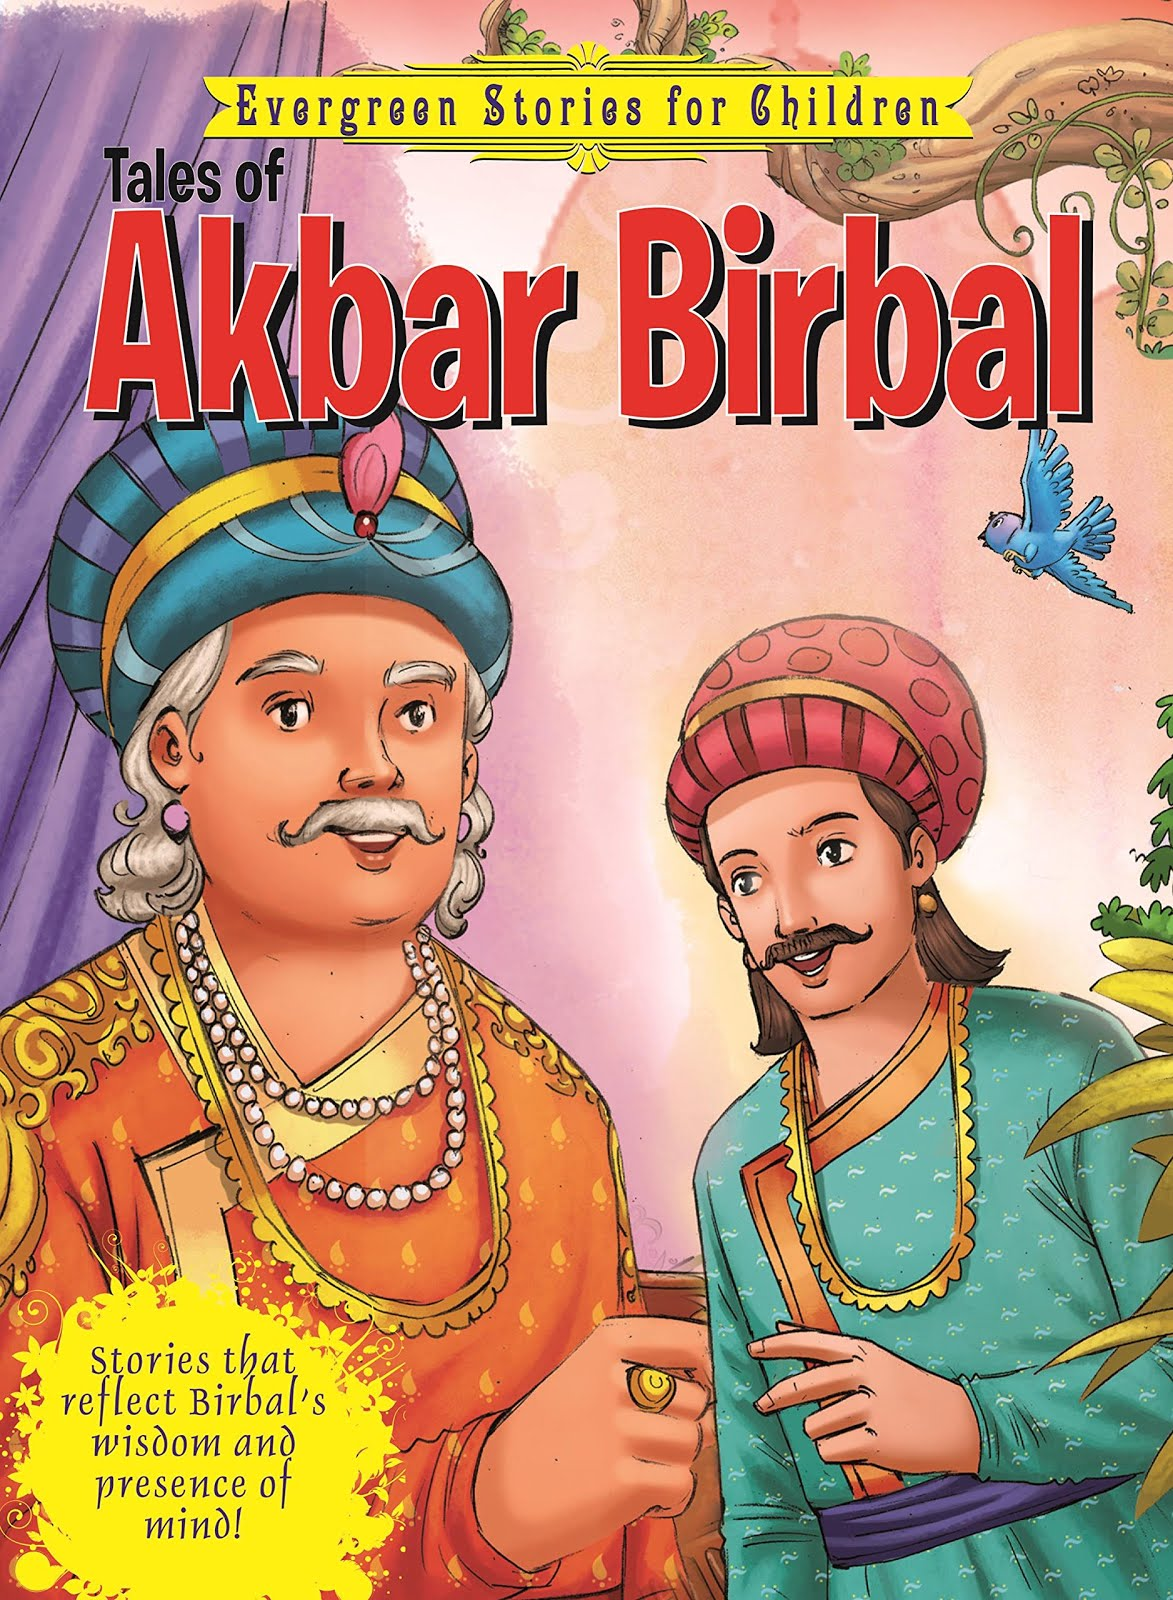 Tales Of Akbar Birbal (2006) Vol - 2 Dual Audio Hindi 150MB HDRip 480p x264